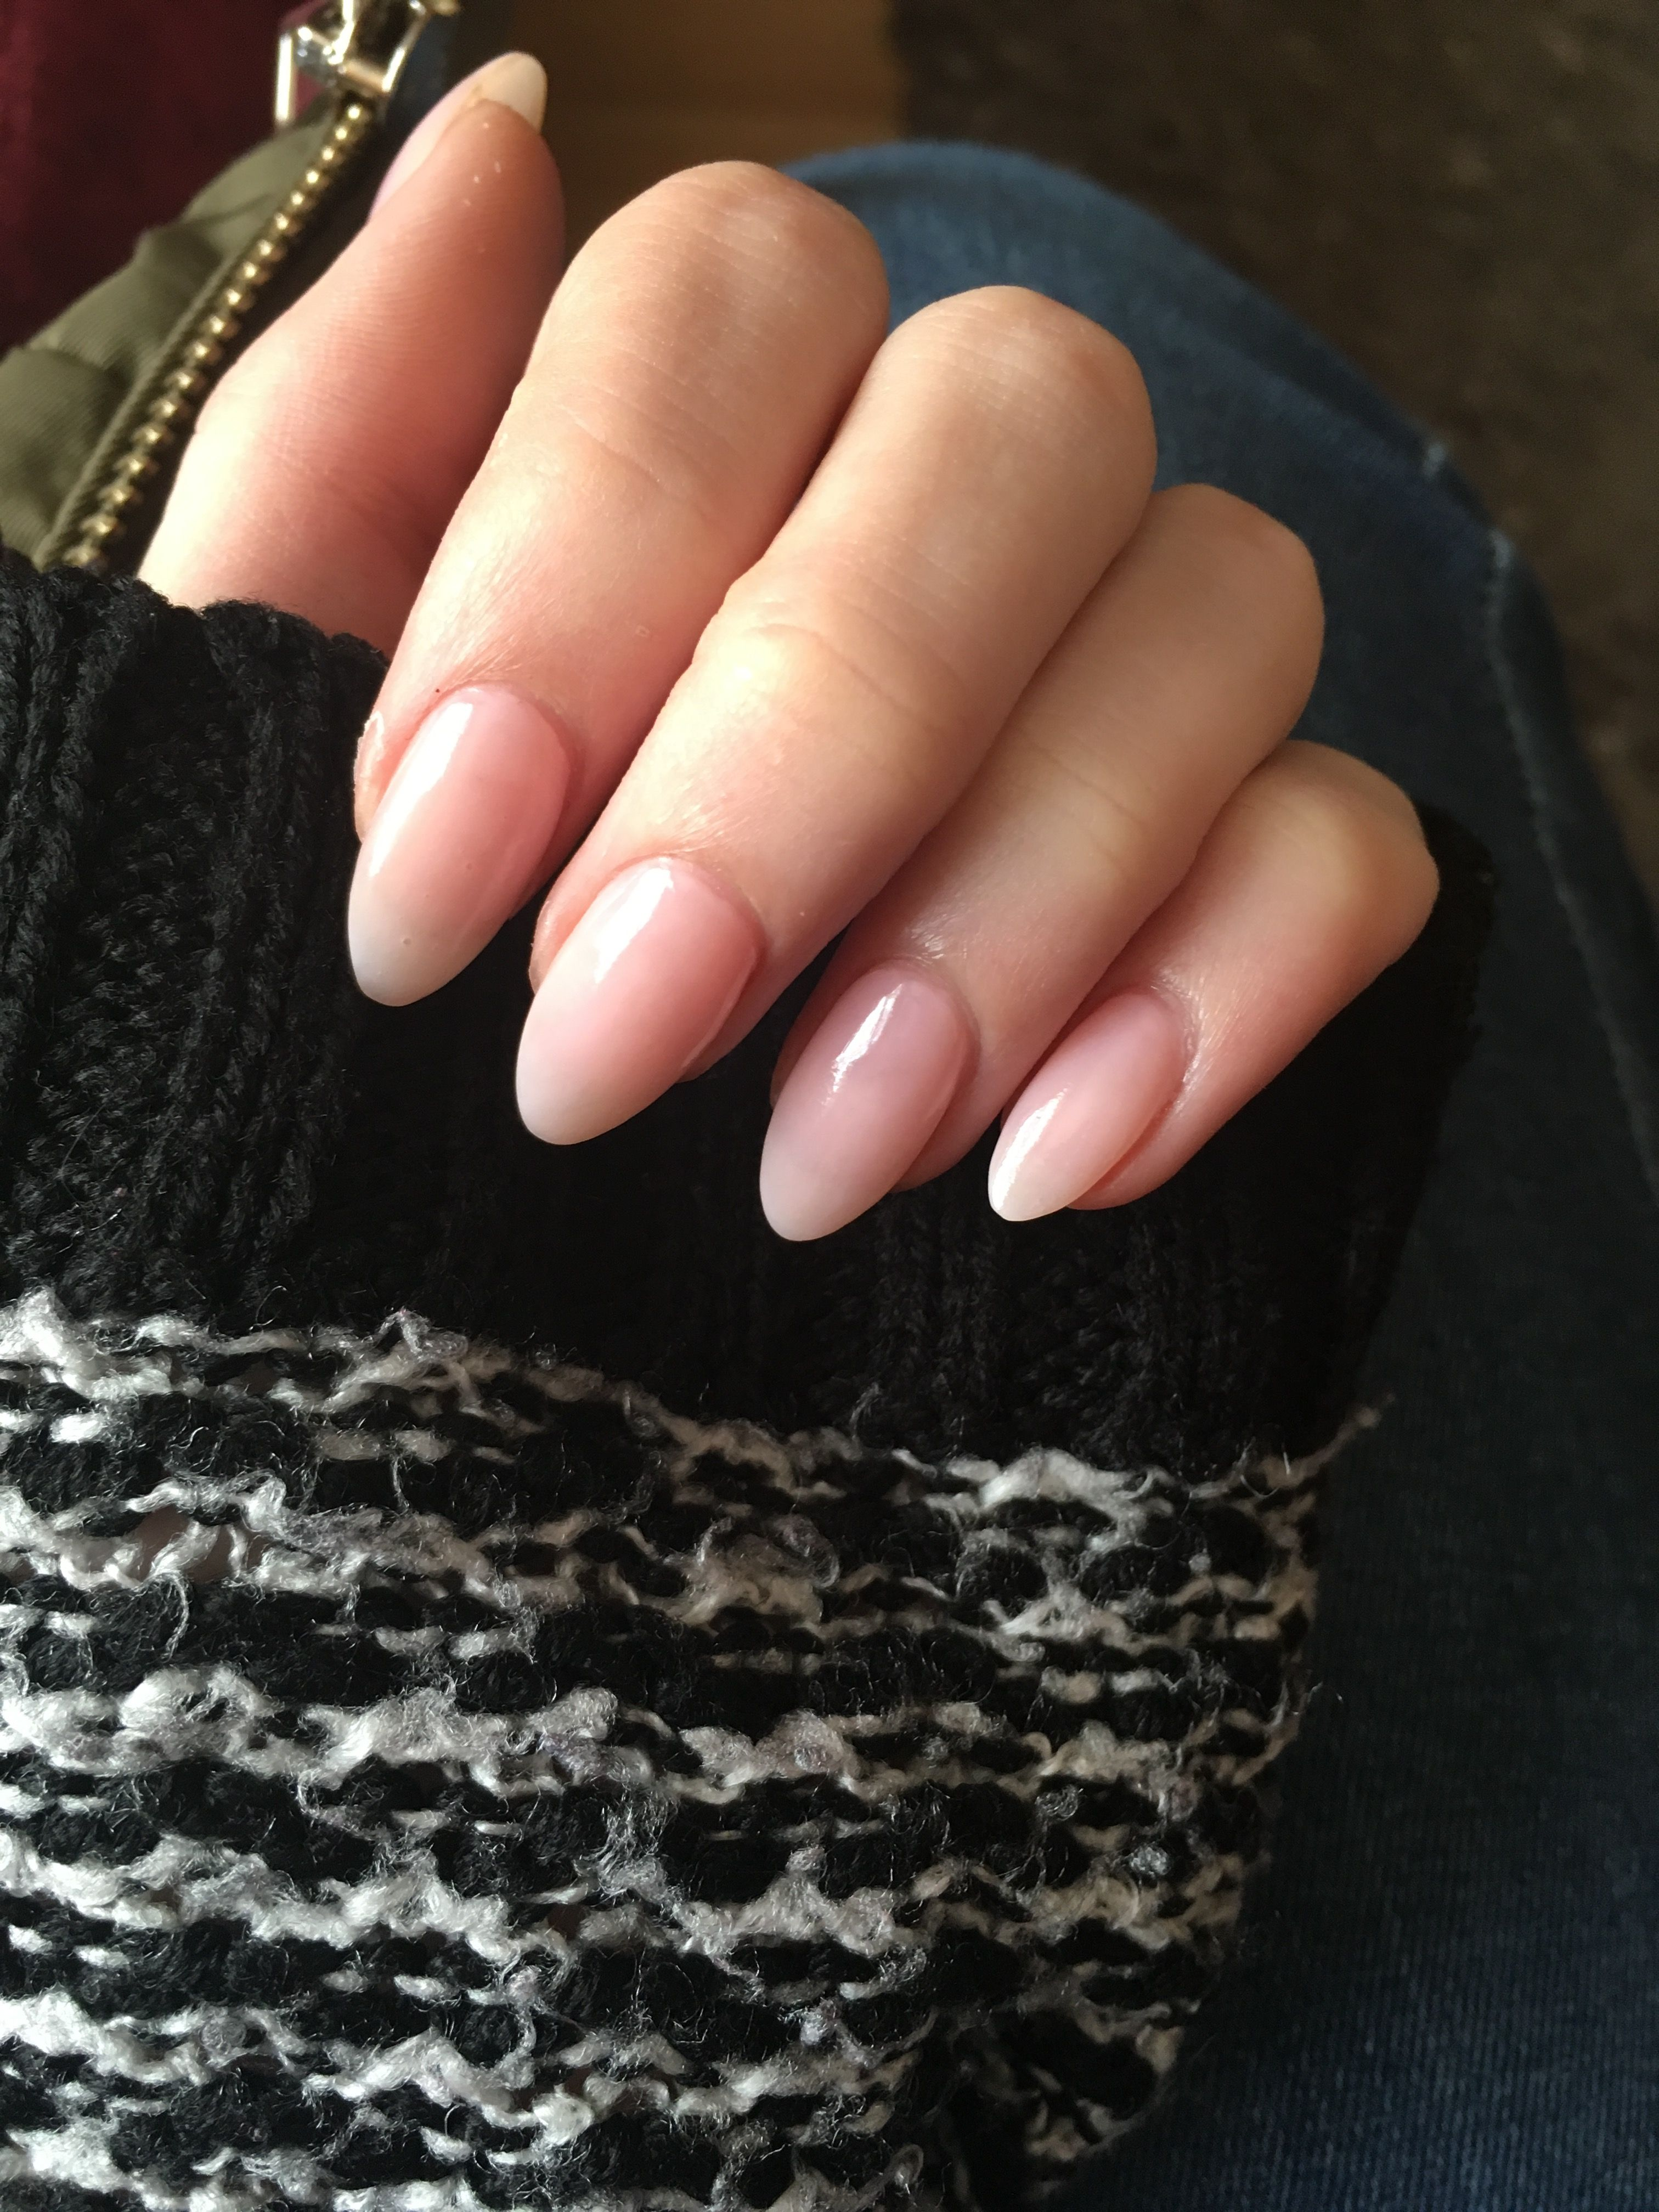 Sheer Pink Natural Acrylic Almond Nails Classy Acrylic Nails Natural Acrylic Nails Natural Nail Designs